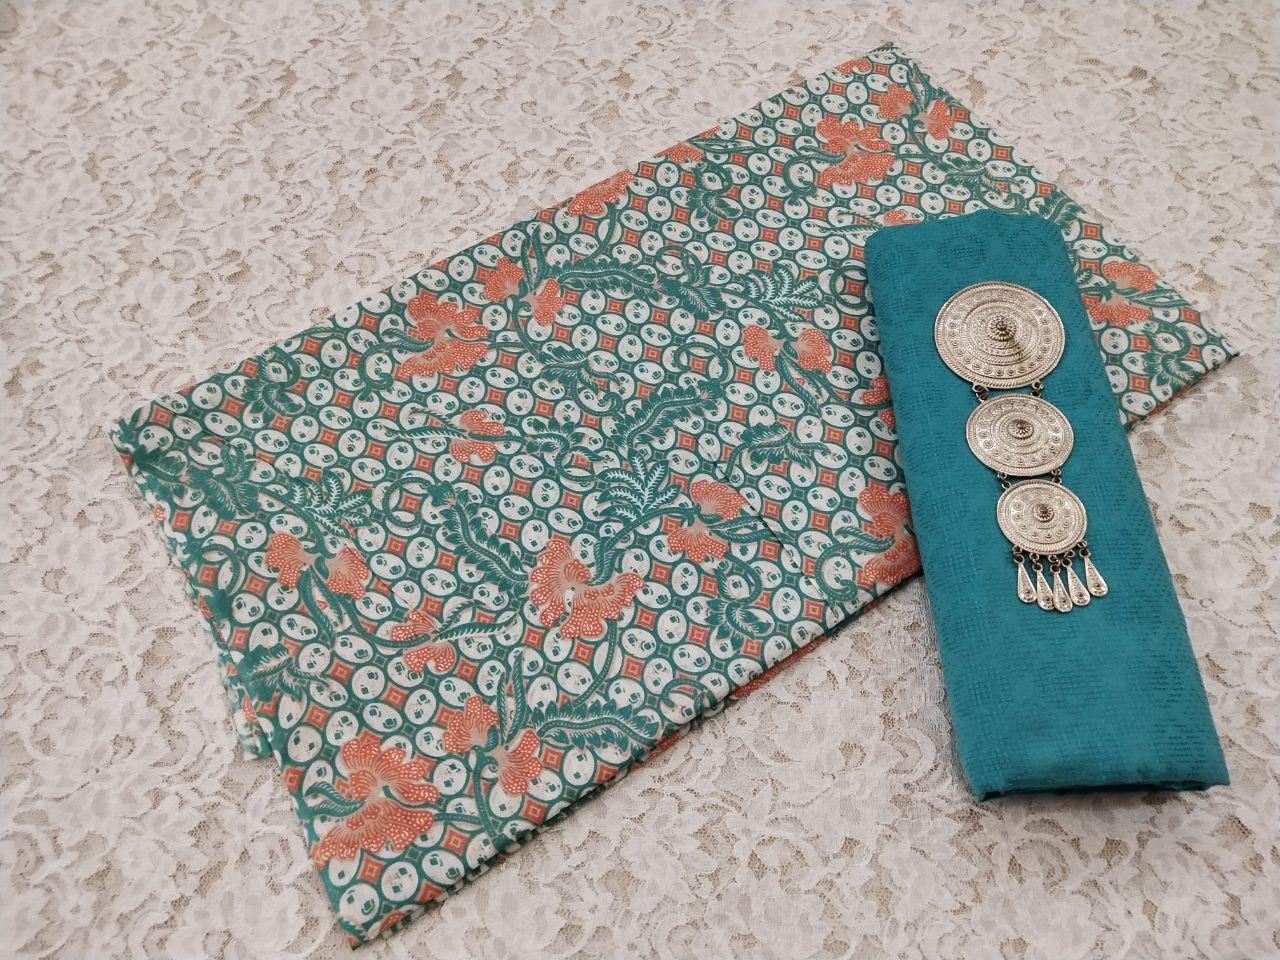 kain batik warna soft motif kawung kecil warna hijau